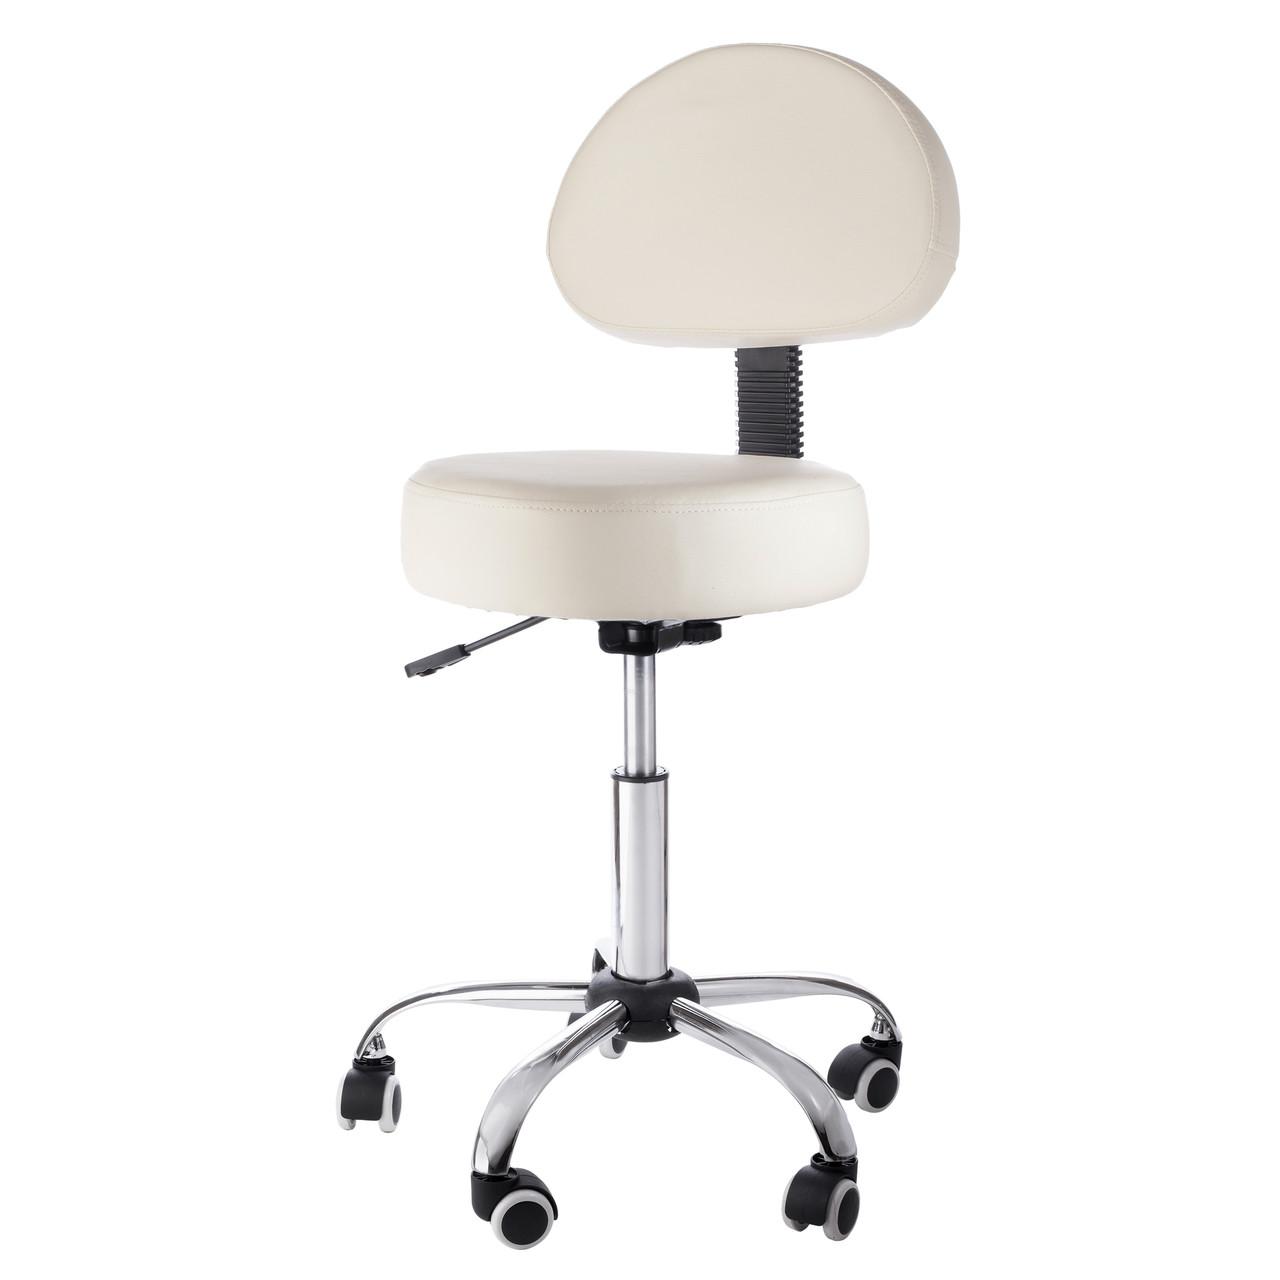 Superb Sivan Health And Fitness Pneumatic Rolling Adjustable Medical Massage Stool With Removable Backrest Beige Ibusinesslaw Wood Chair Design Ideas Ibusinesslaworg